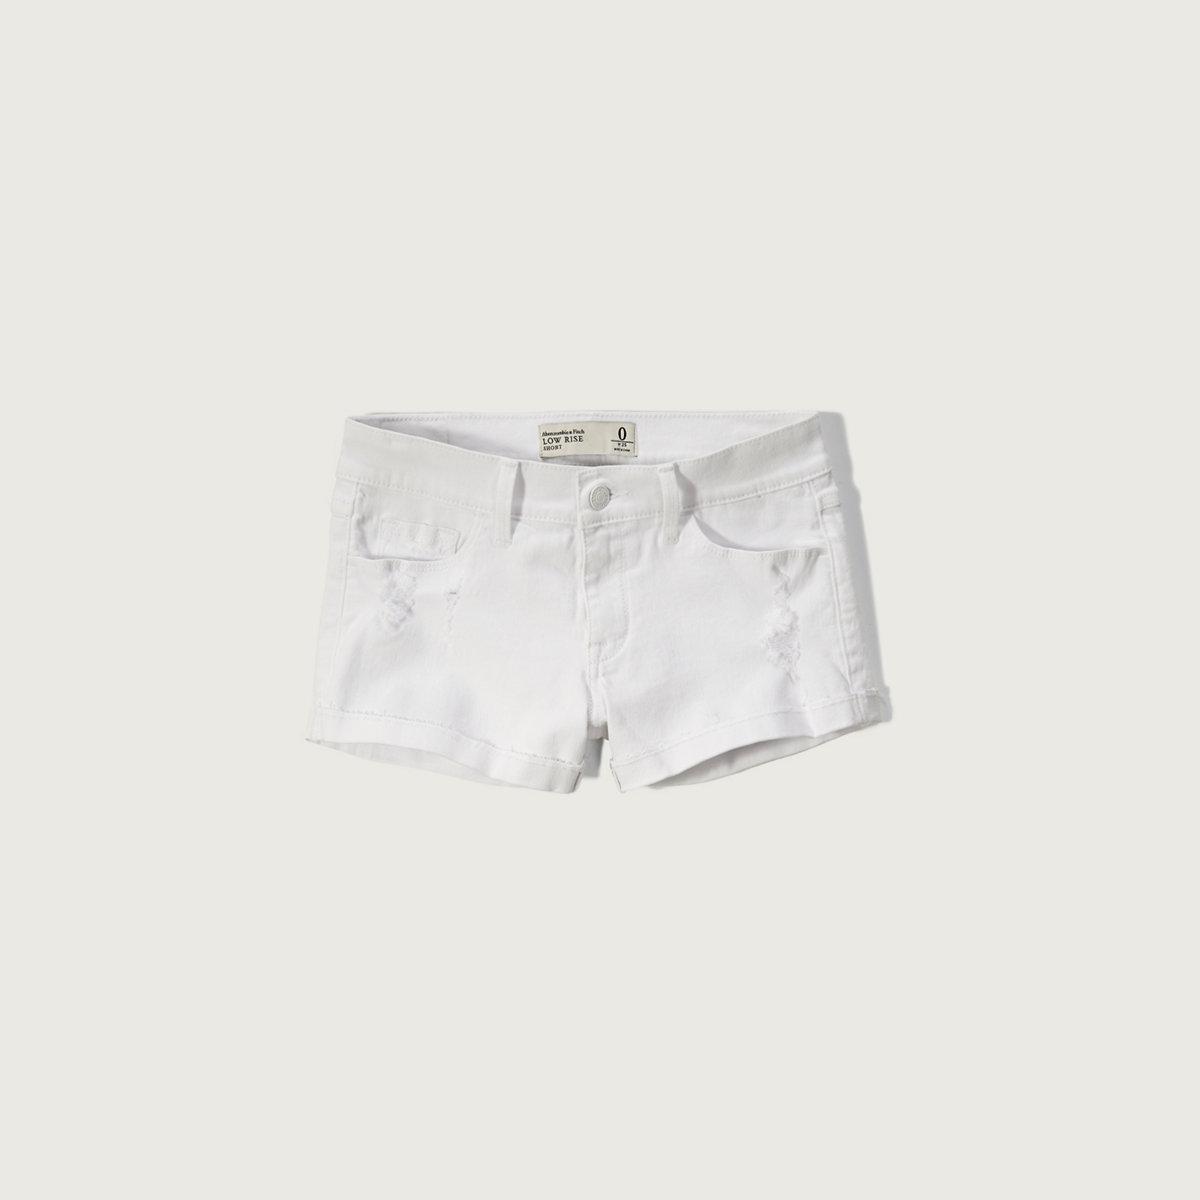 Low Rise 2 Inch Stretch Denim Shorts